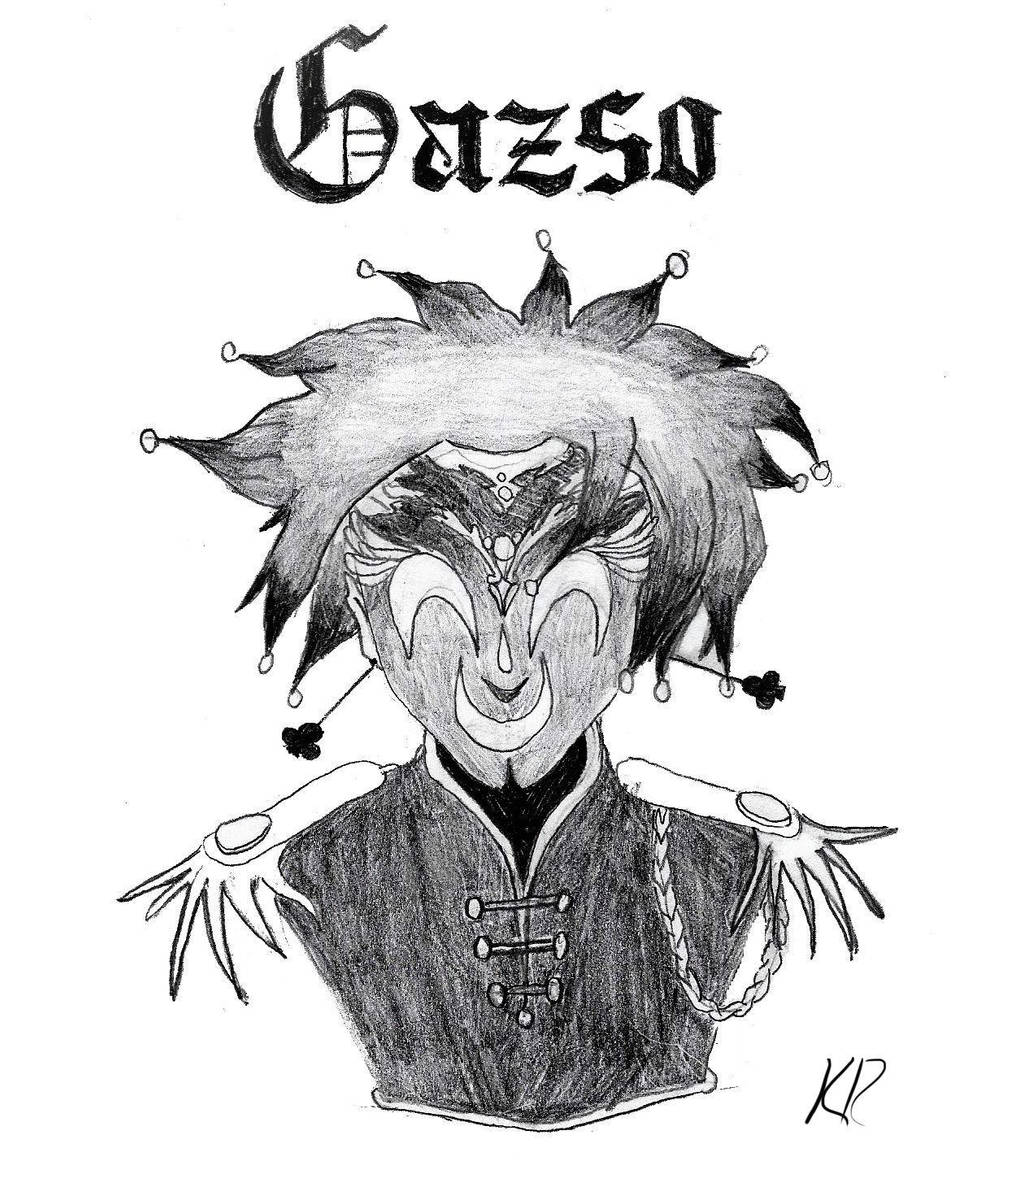 Gazso by kittycheetah14